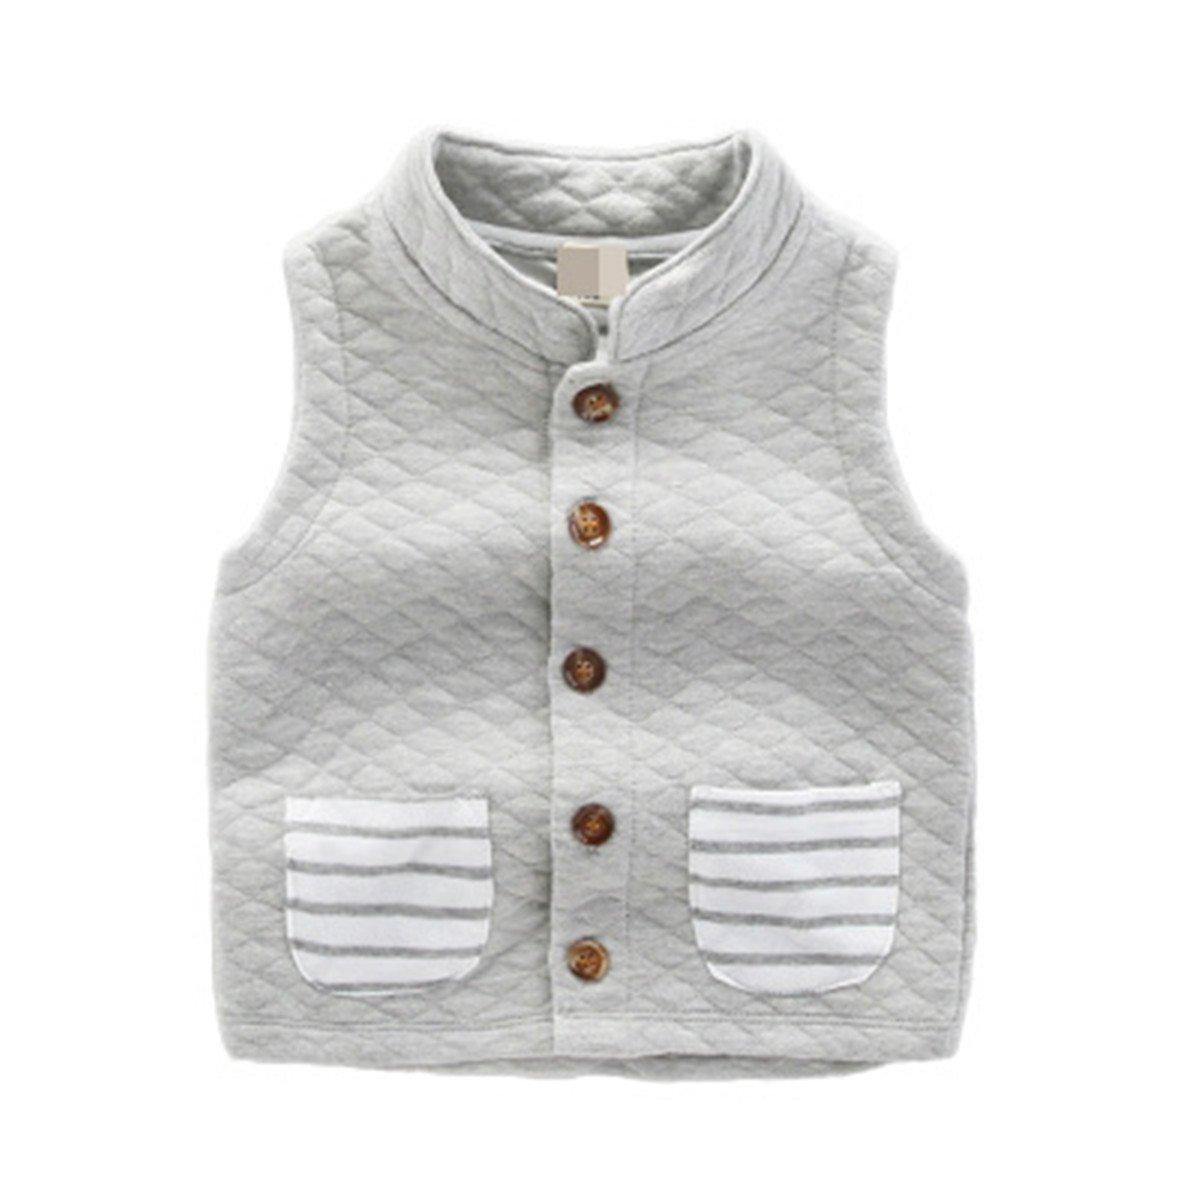 Toddler Unisex Infant Kid Boys Girls Front Button Pocket Fleece Vest Waistcoat bhnvytvo91